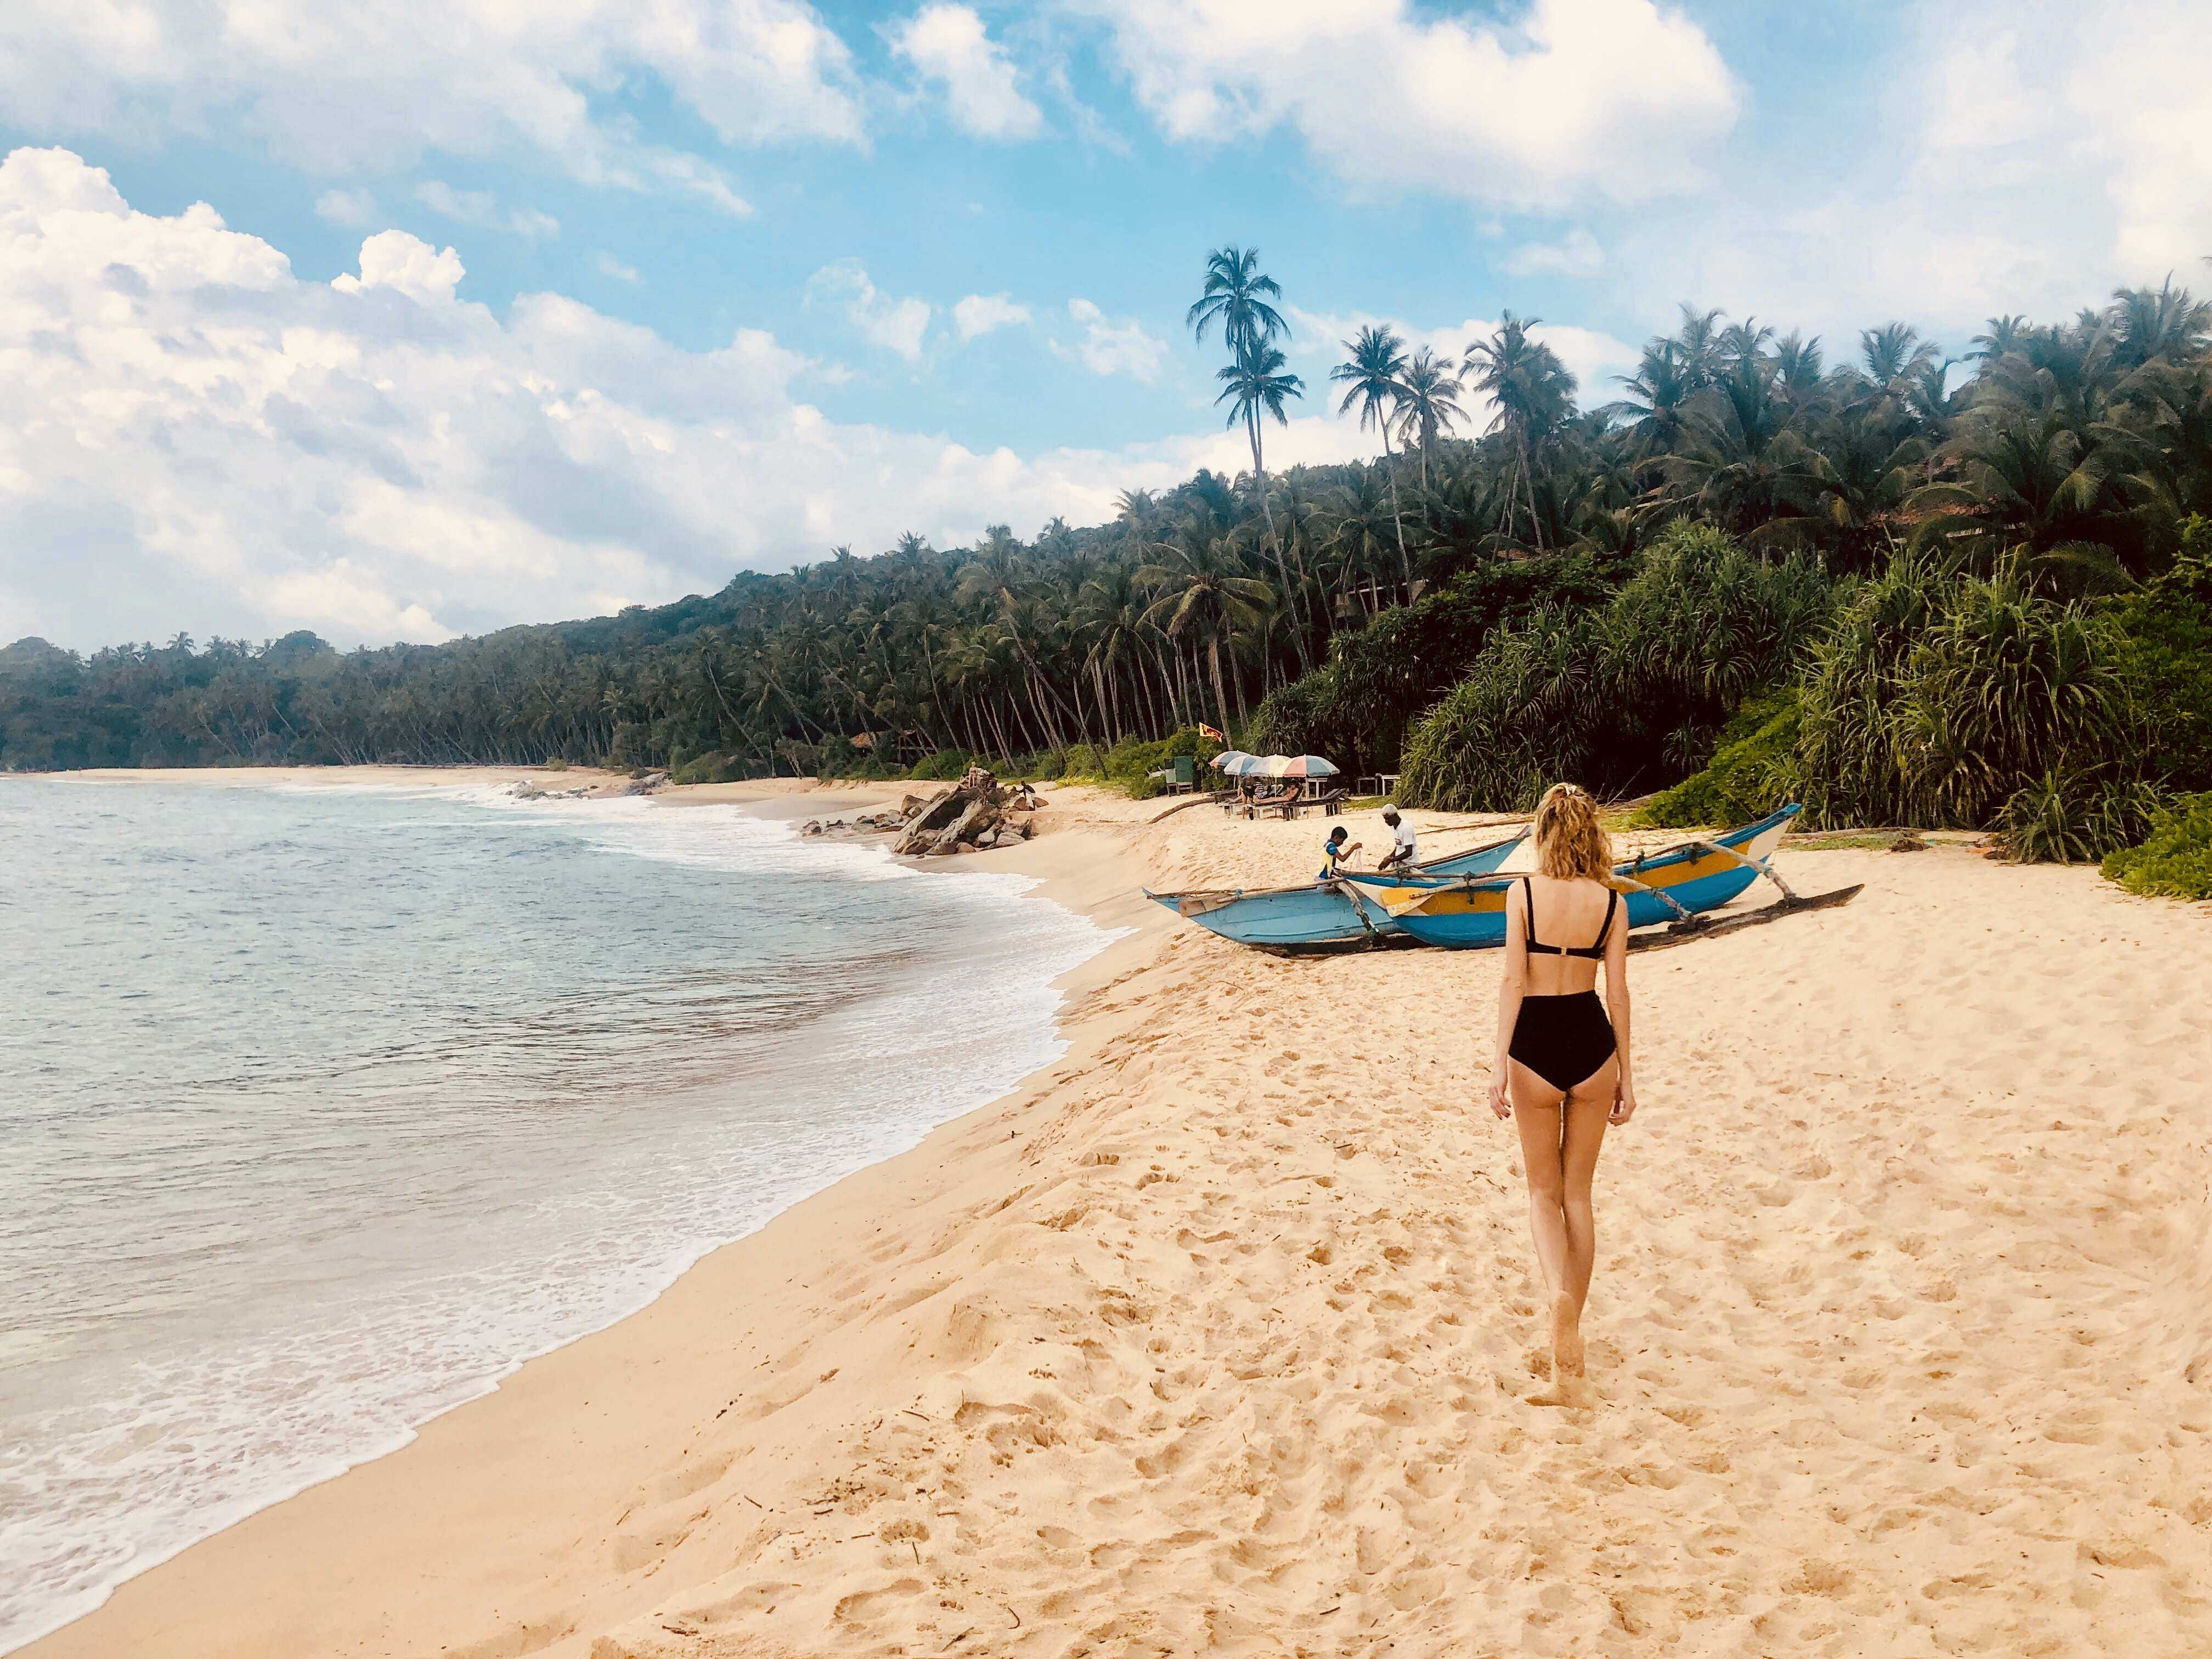 Country - Sri Lanka